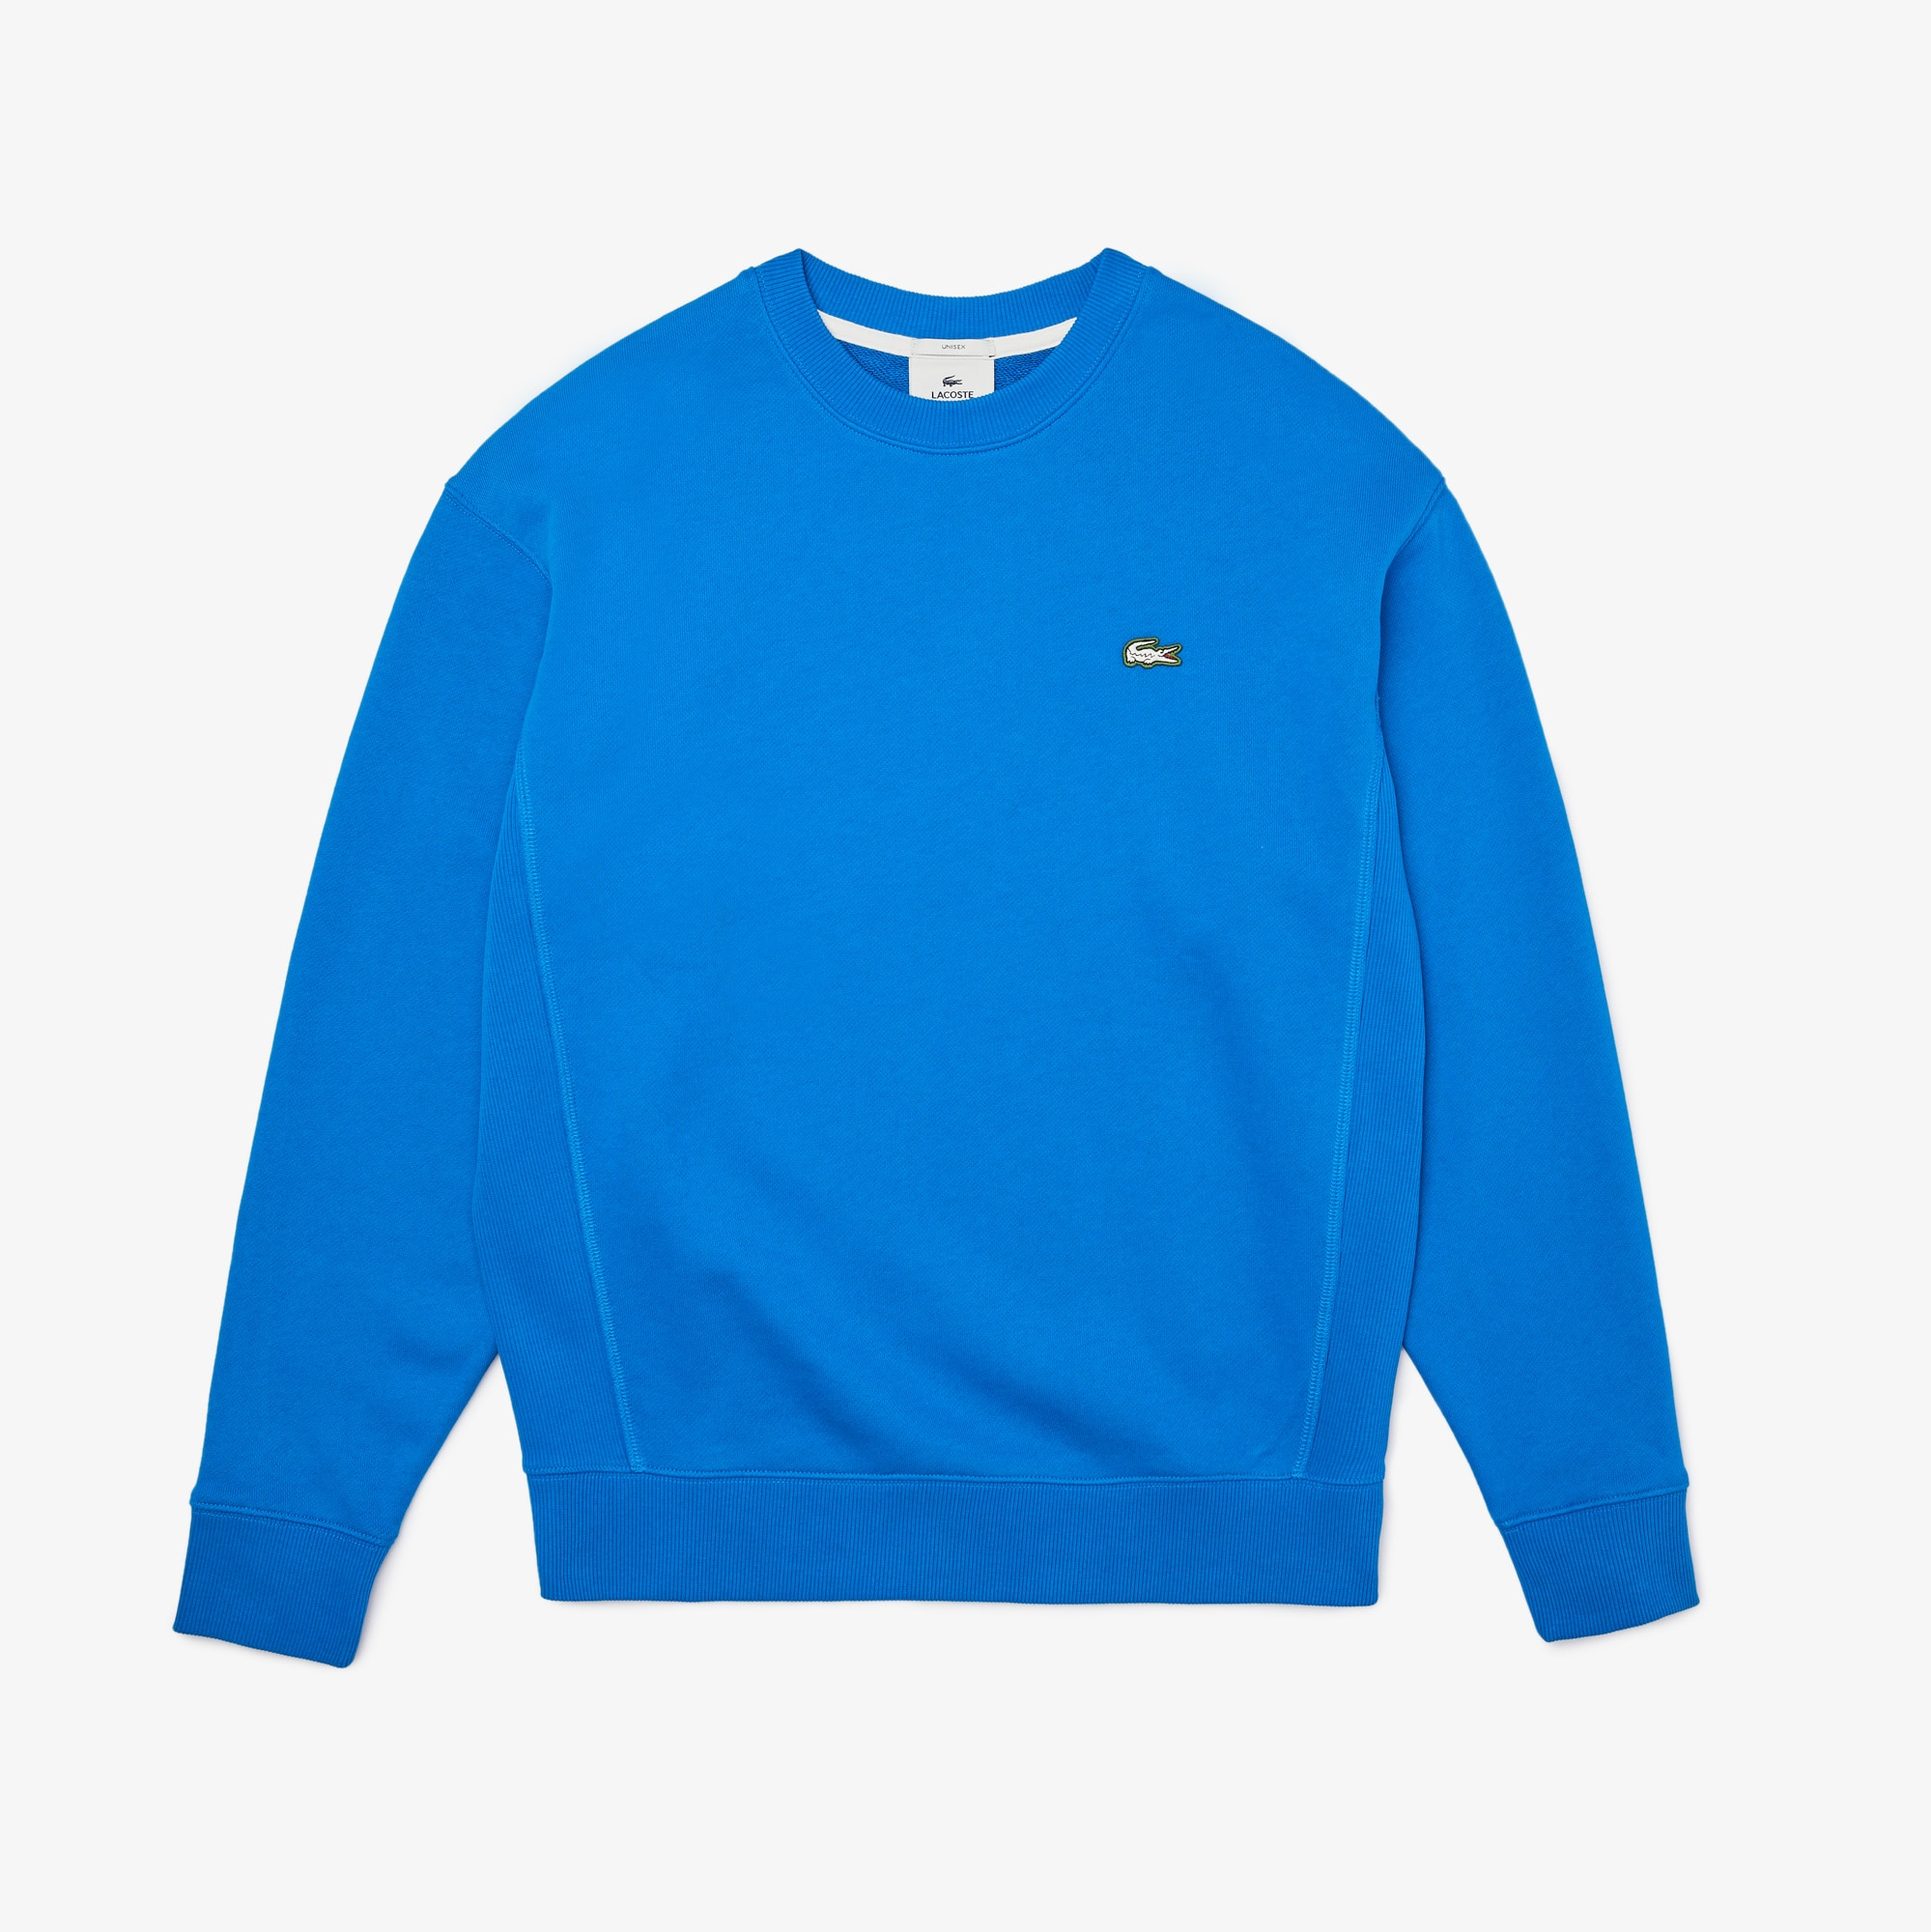 Unisex LACOSTE L!VE Sweatshirt aus Baumwollfleece